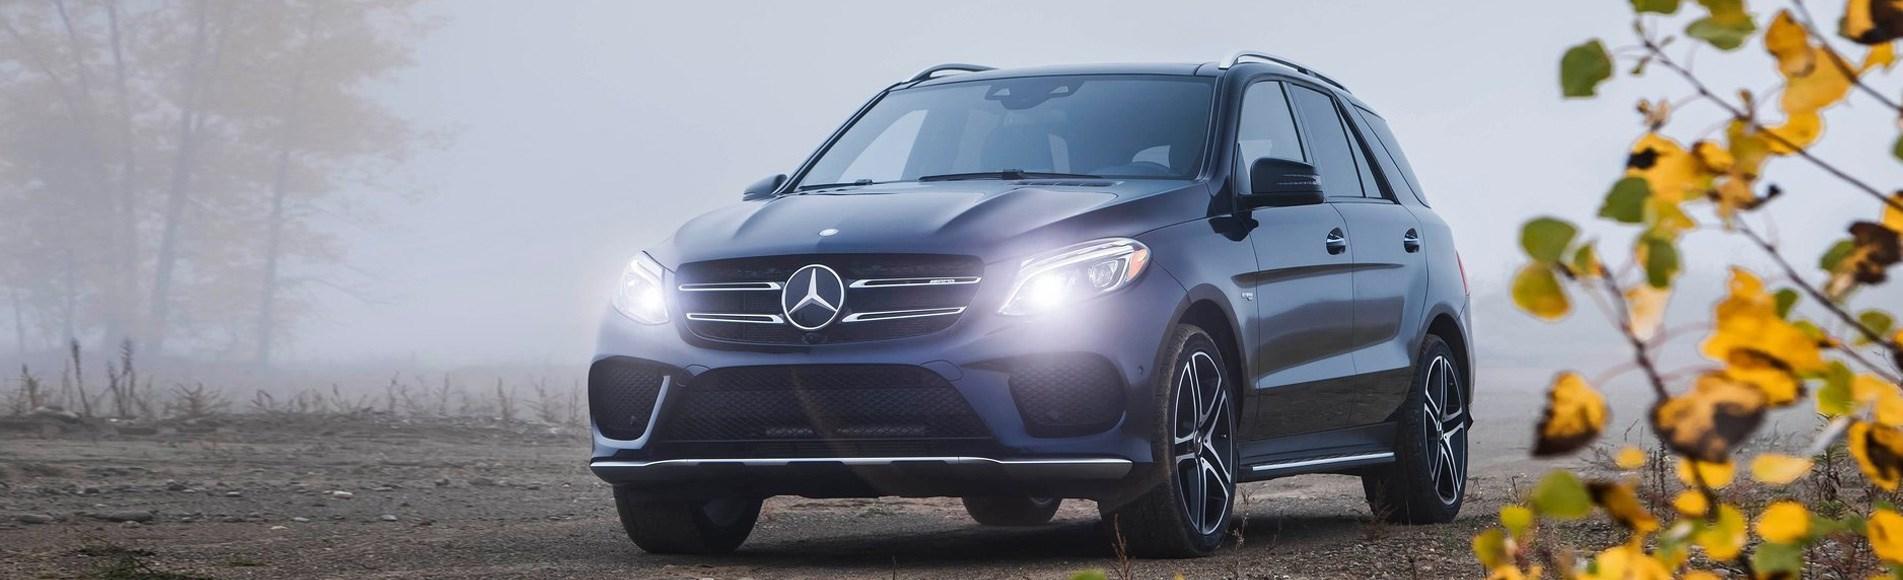 Used Cars For Sale Plainwell MI | Car For Sale In Michigan | ReCar ...